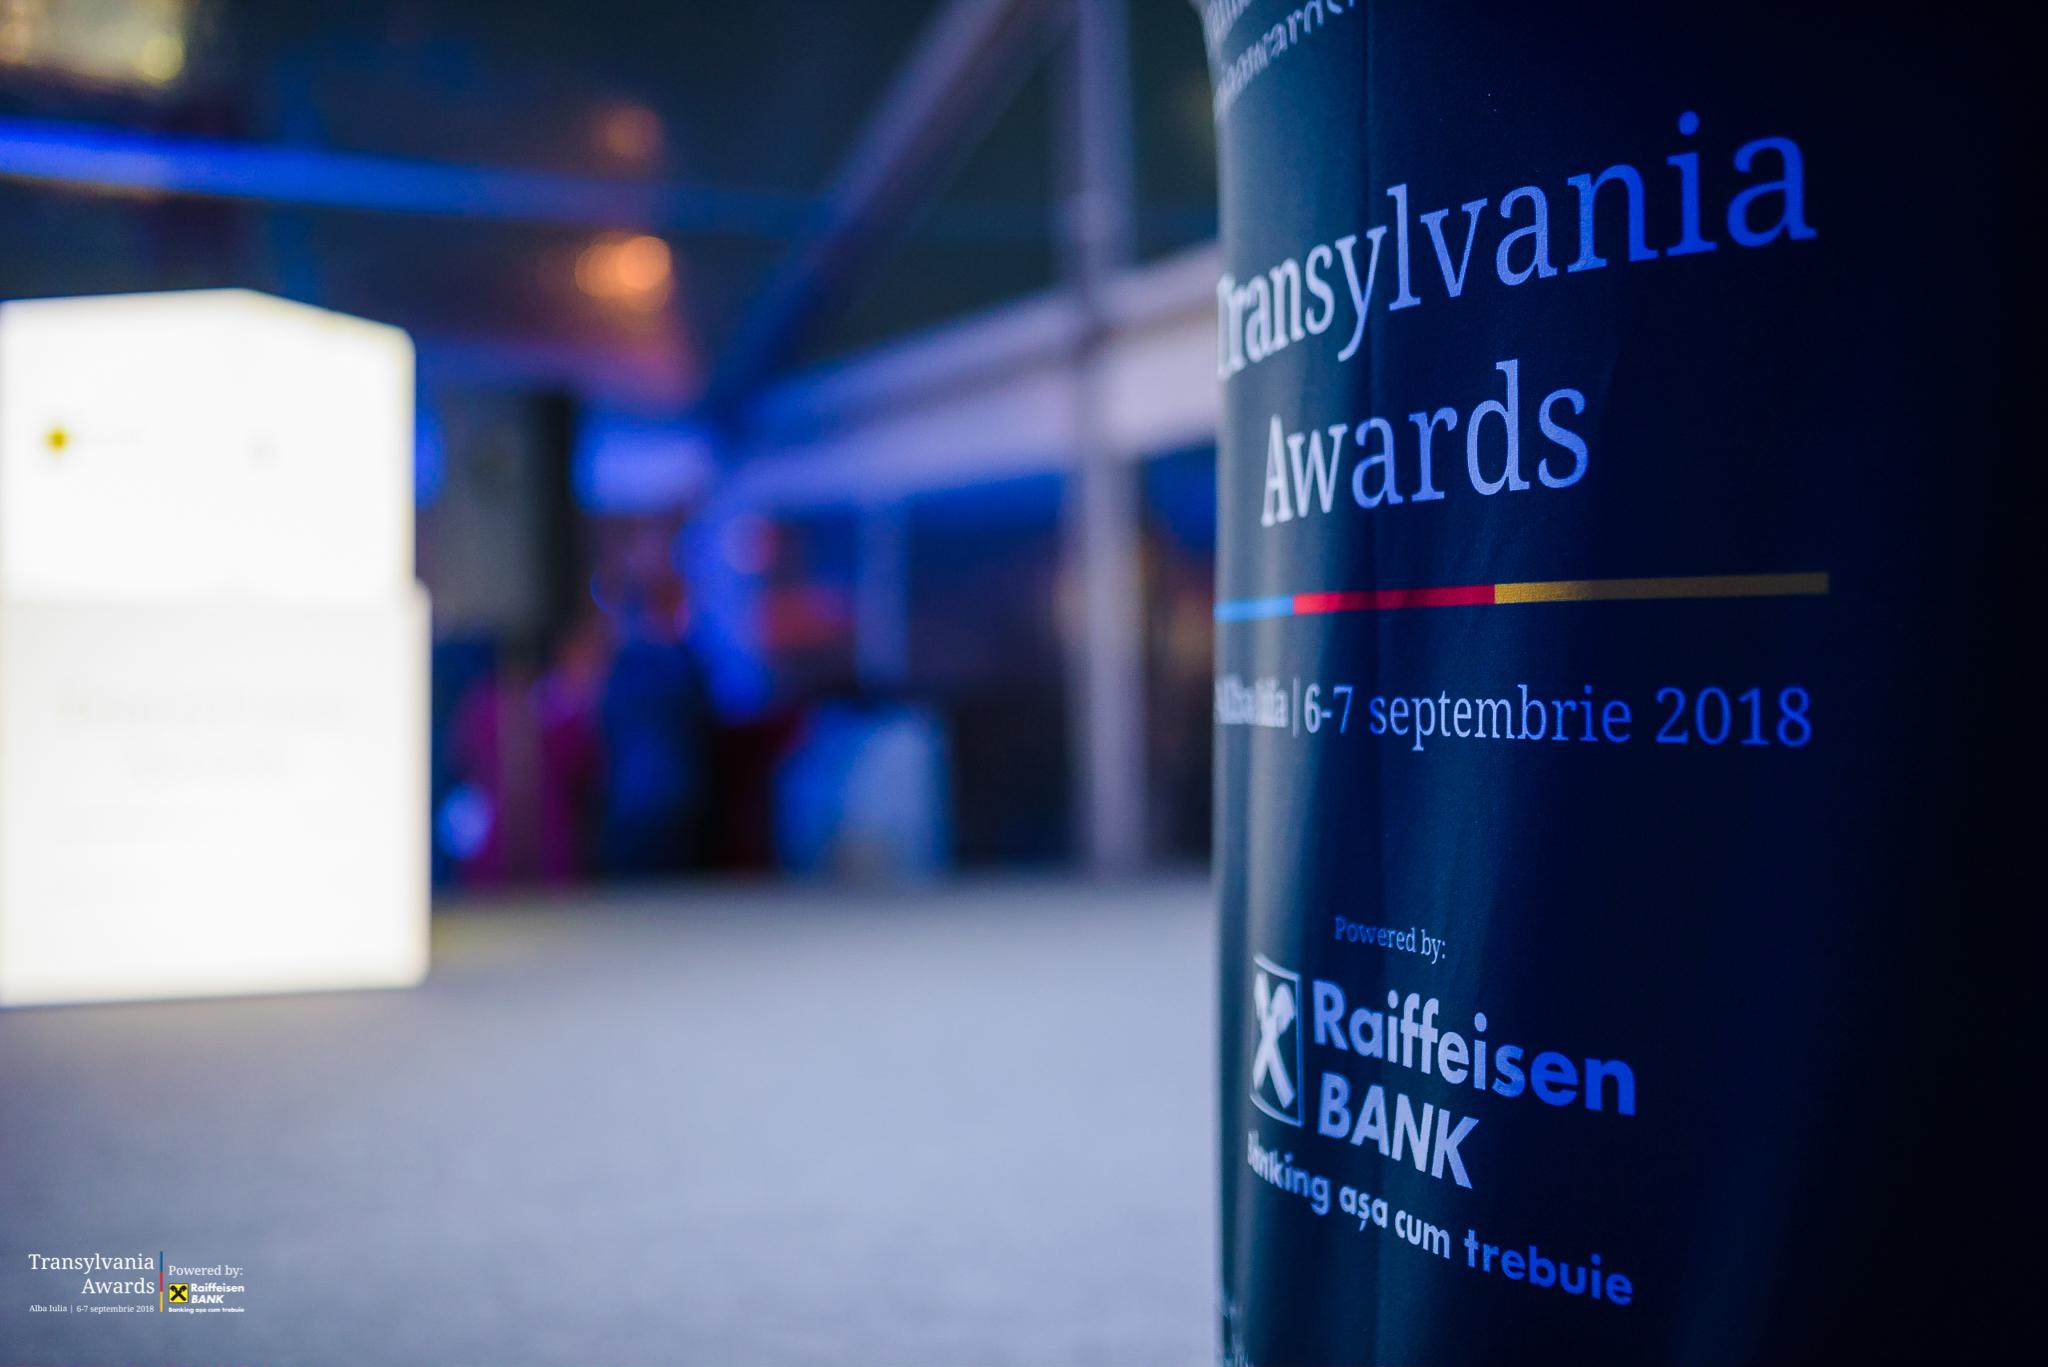 transylvania awards septembrie 2018_06_09_2018_Vlad Cupsa_VL2_1324.jpg